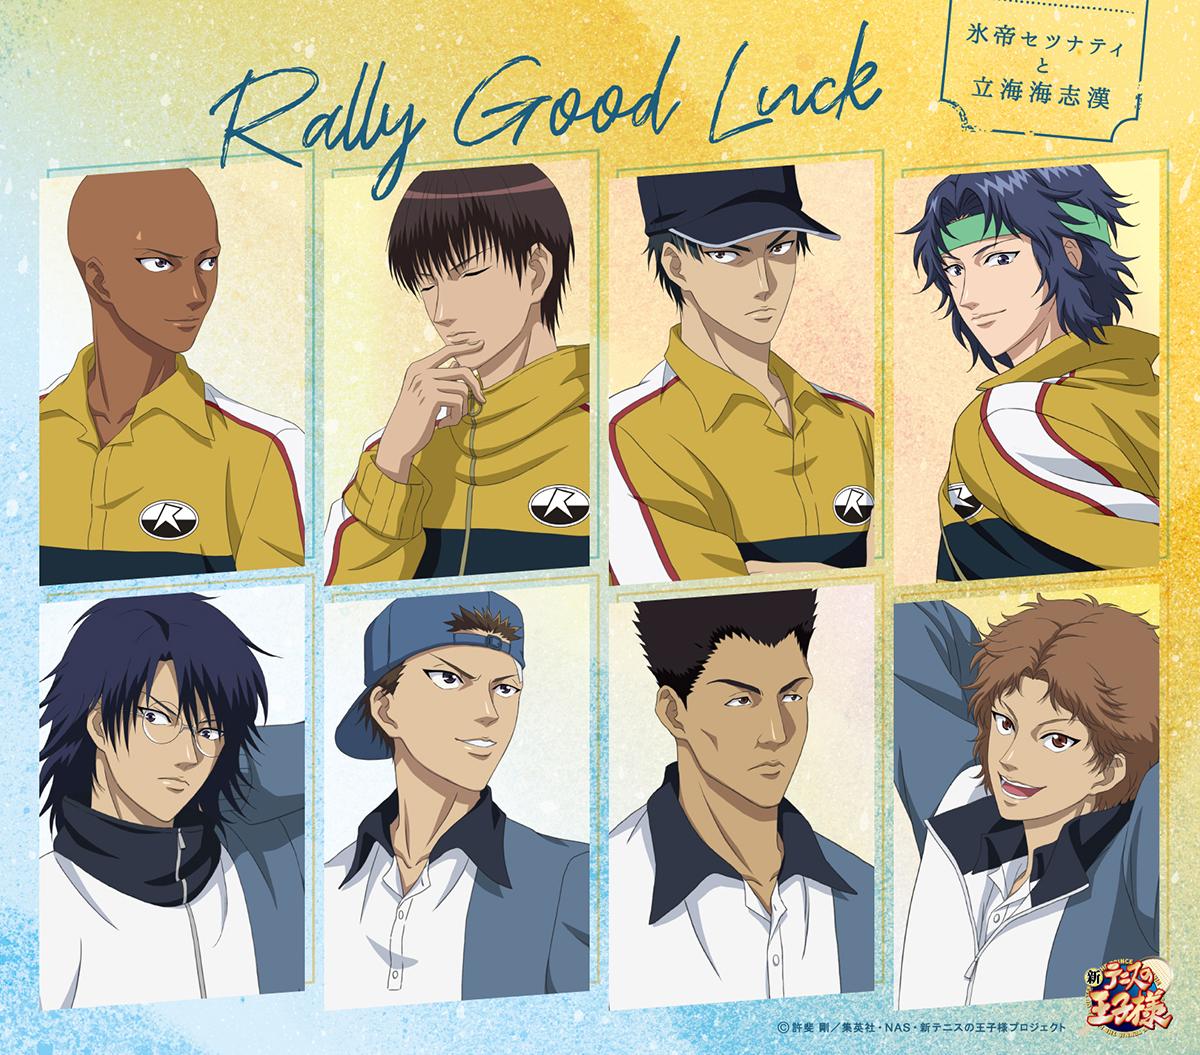 「Rally Good Luck」氷帝セツナティと立海海志漢